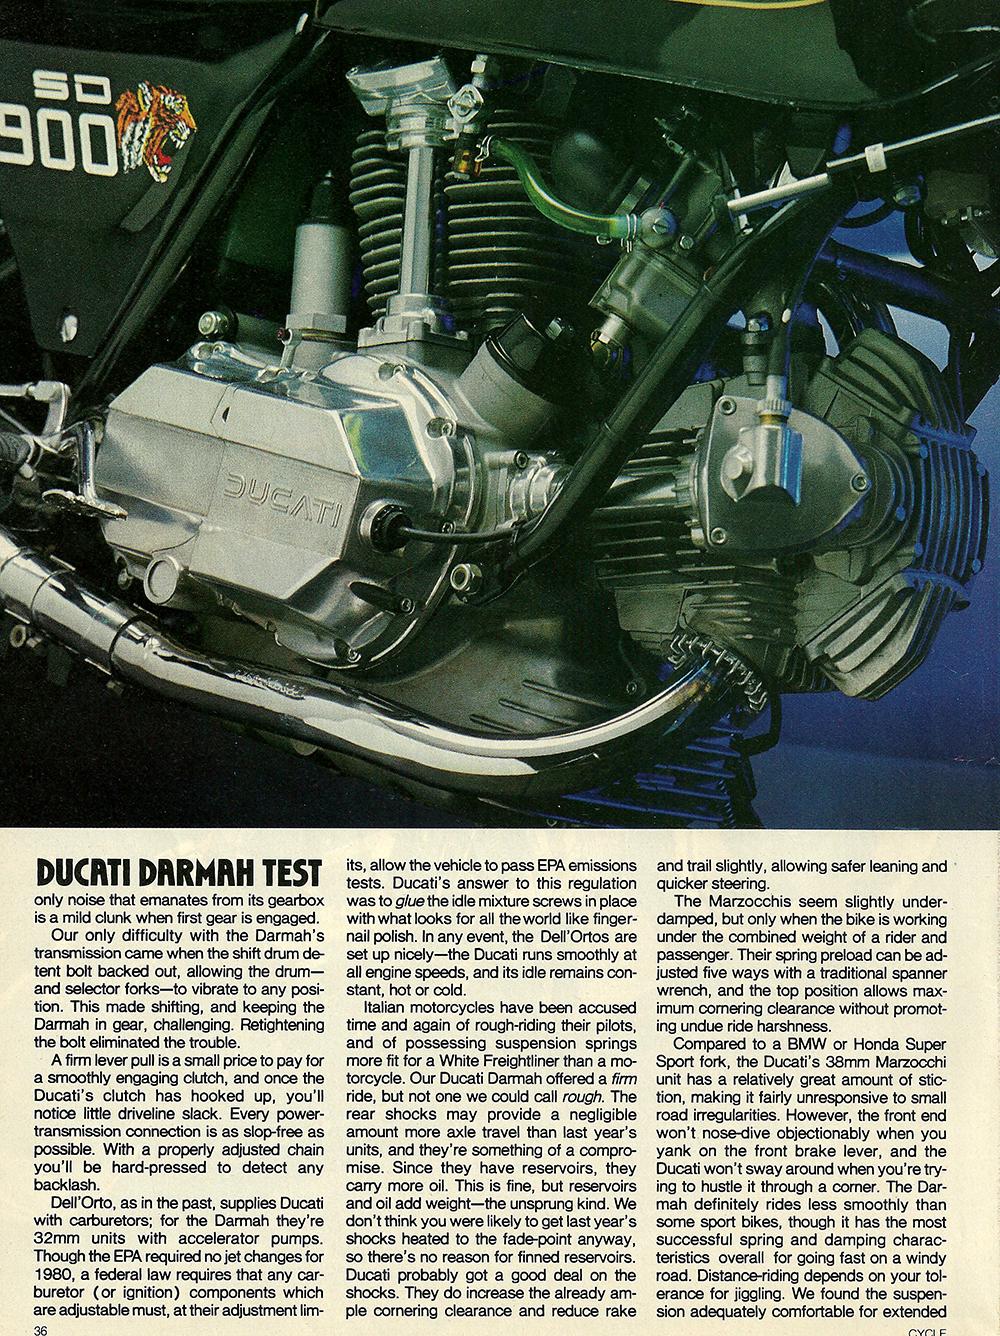 1980 Ducati Darmah 900 SD road test 05.jpg